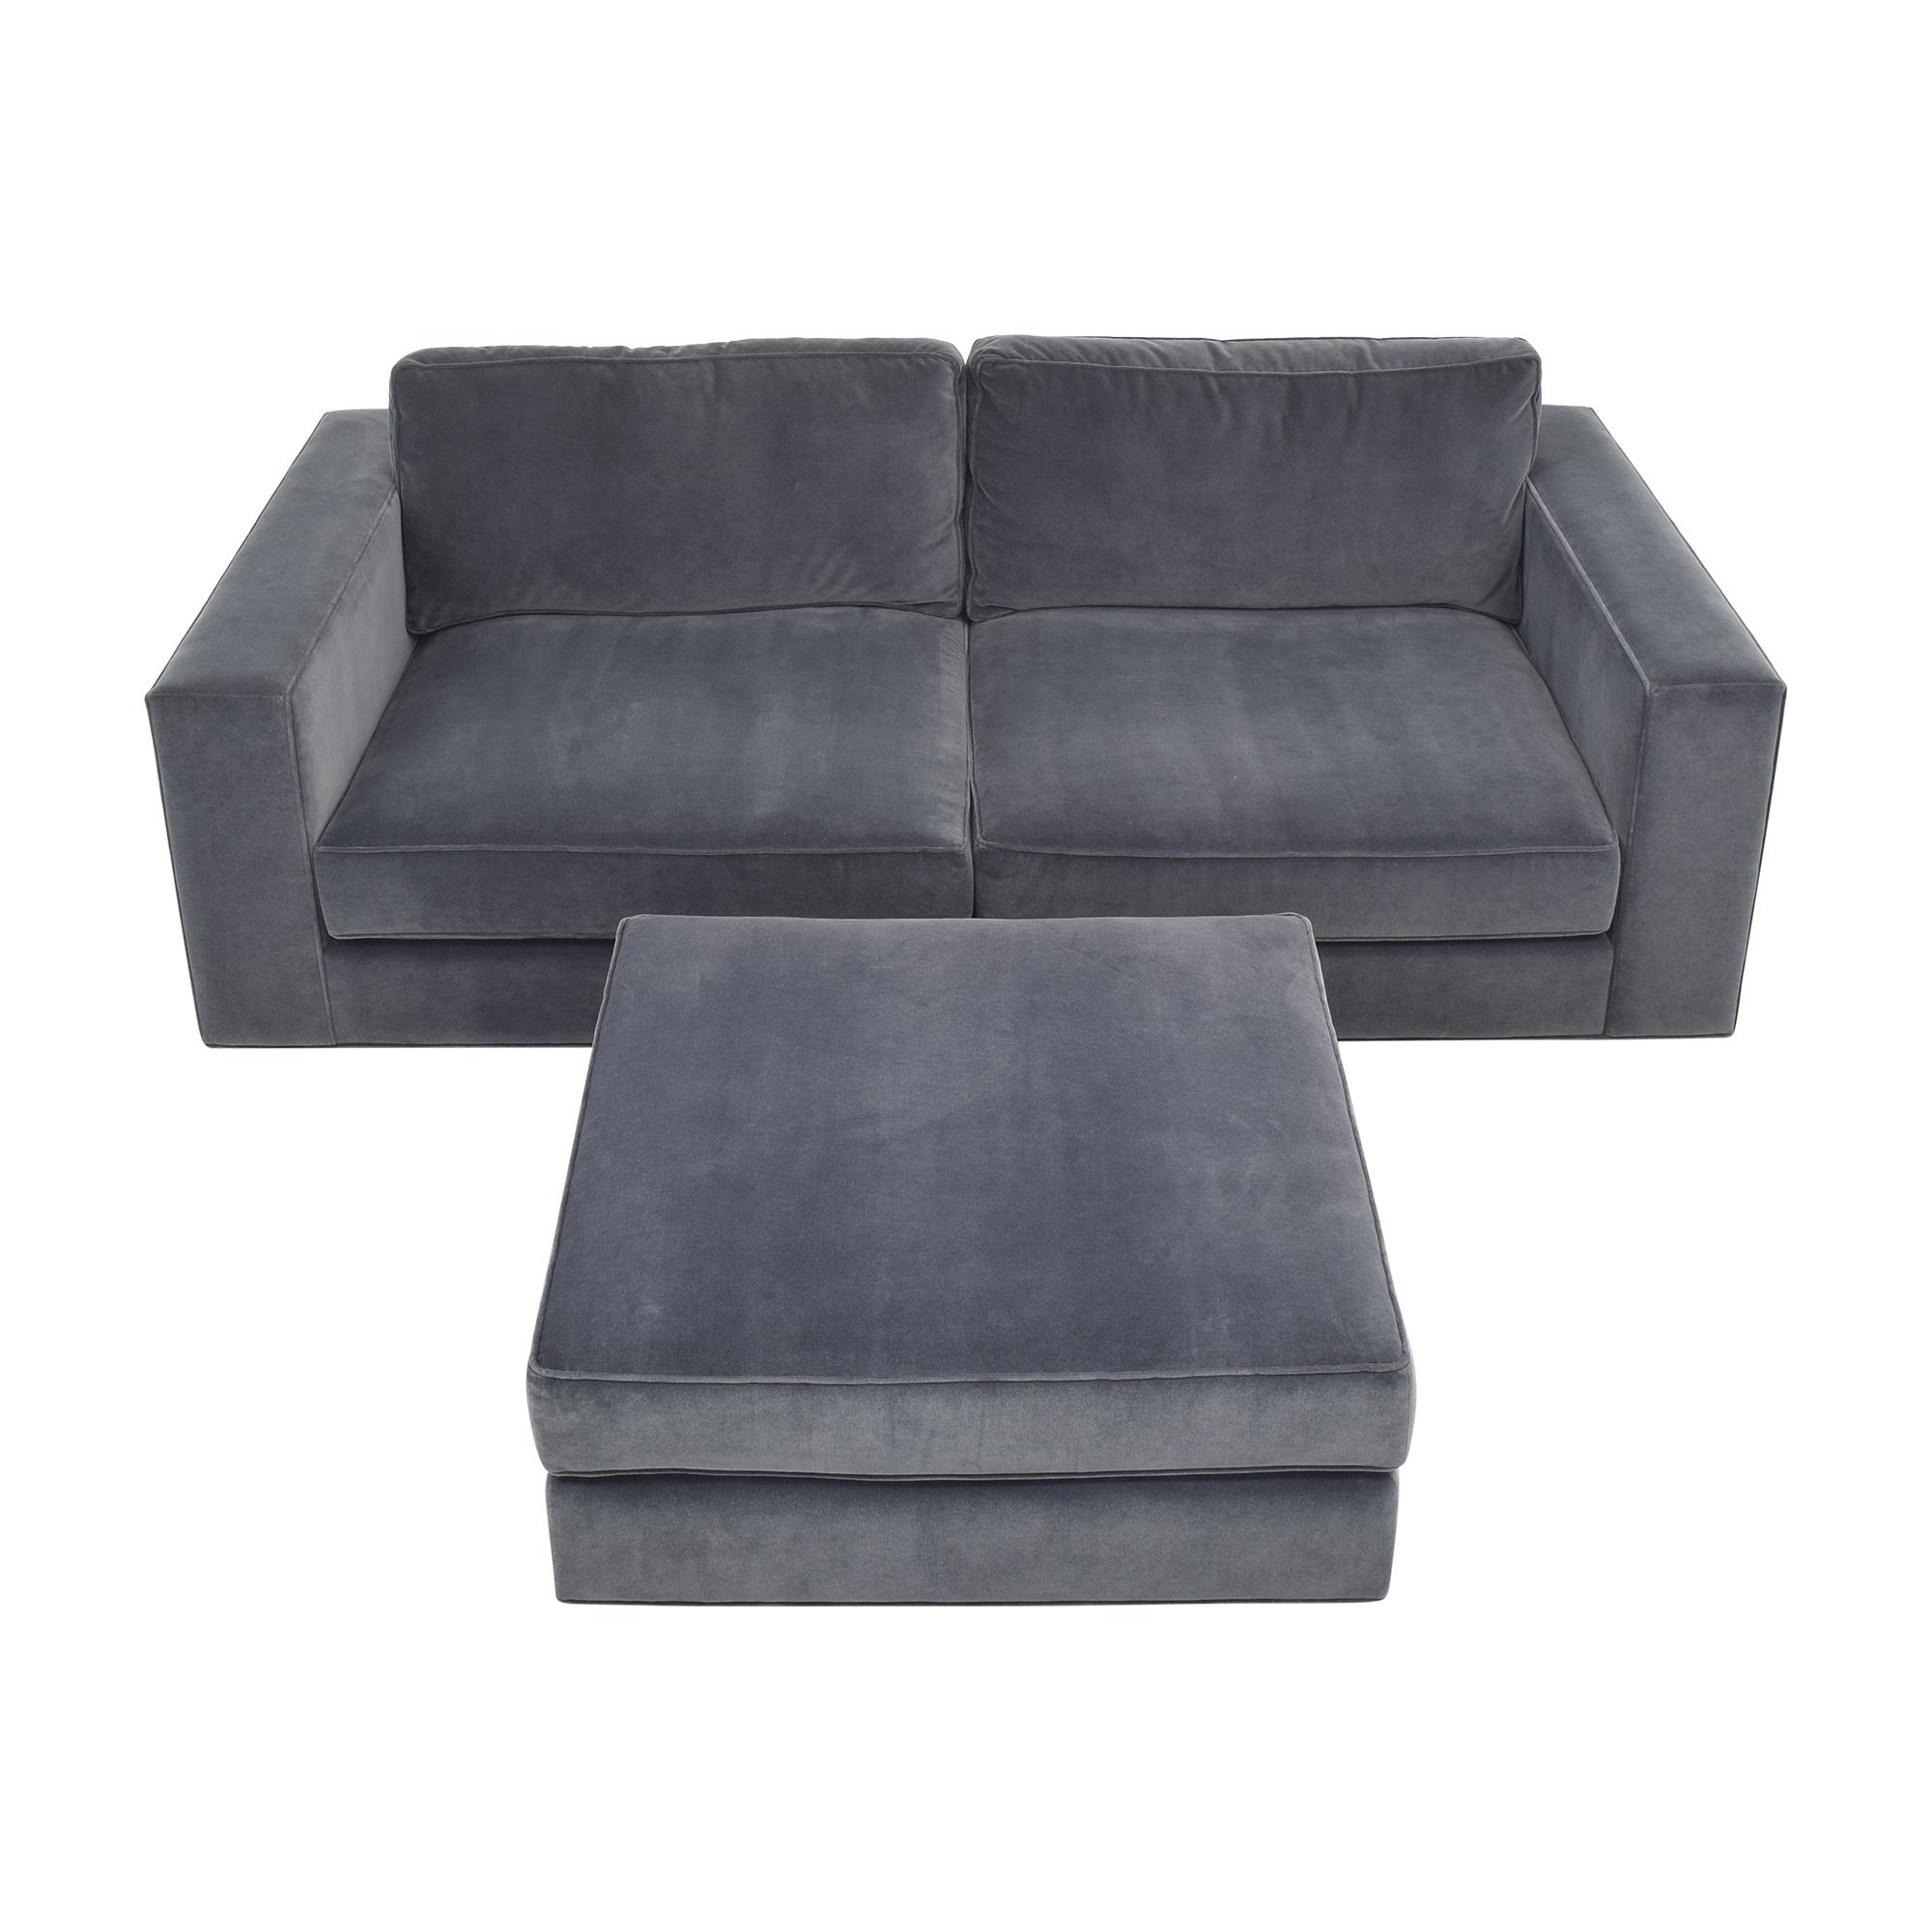 Restoration Hardware Restoration Hardware Maddox Sectional Sofa with Ottoman dark blue